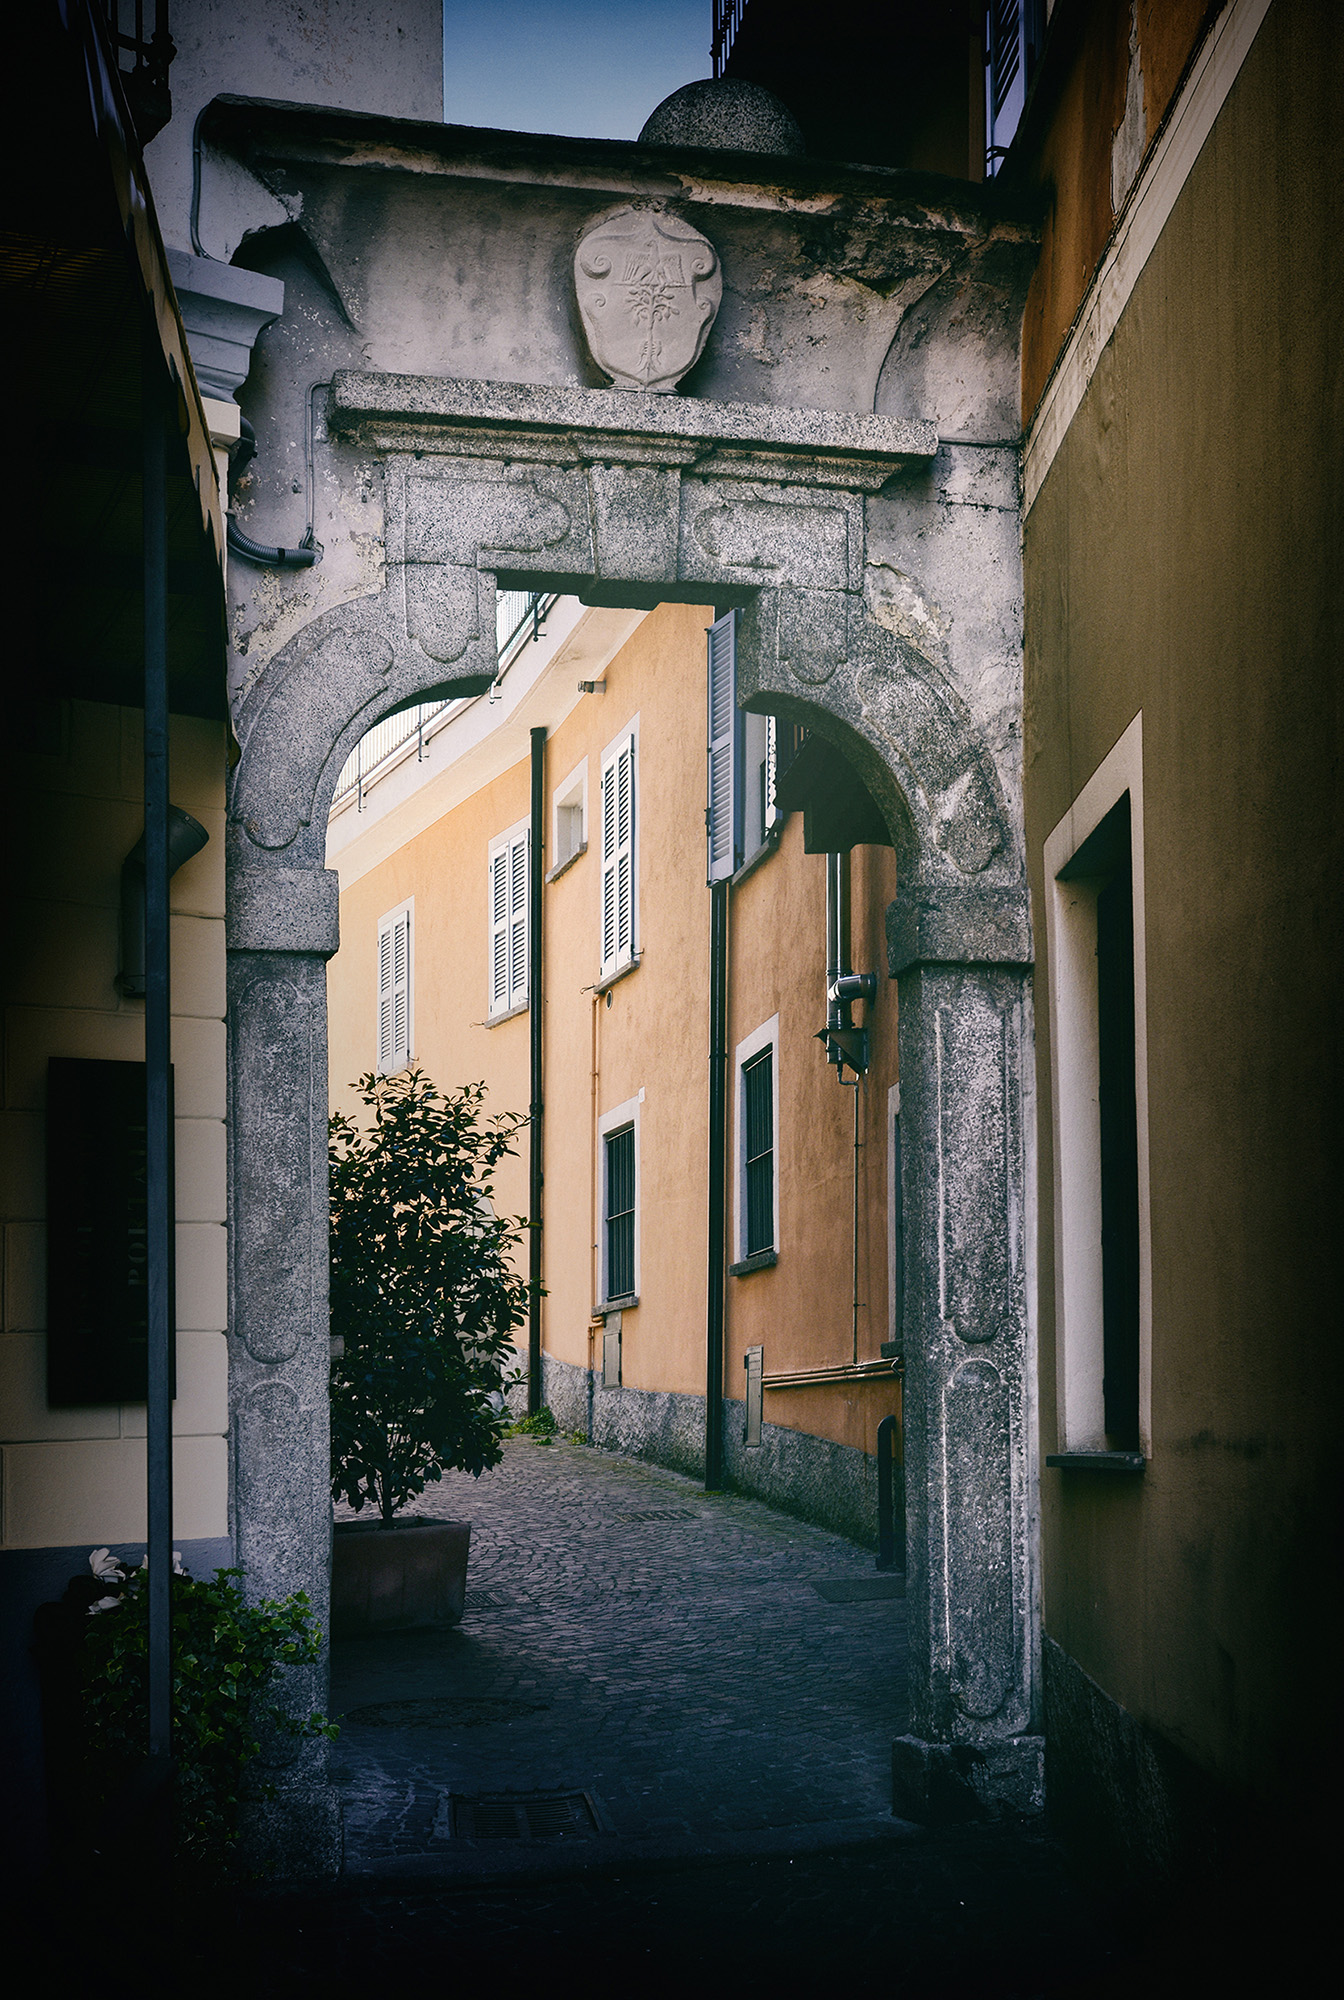 Via Sassello